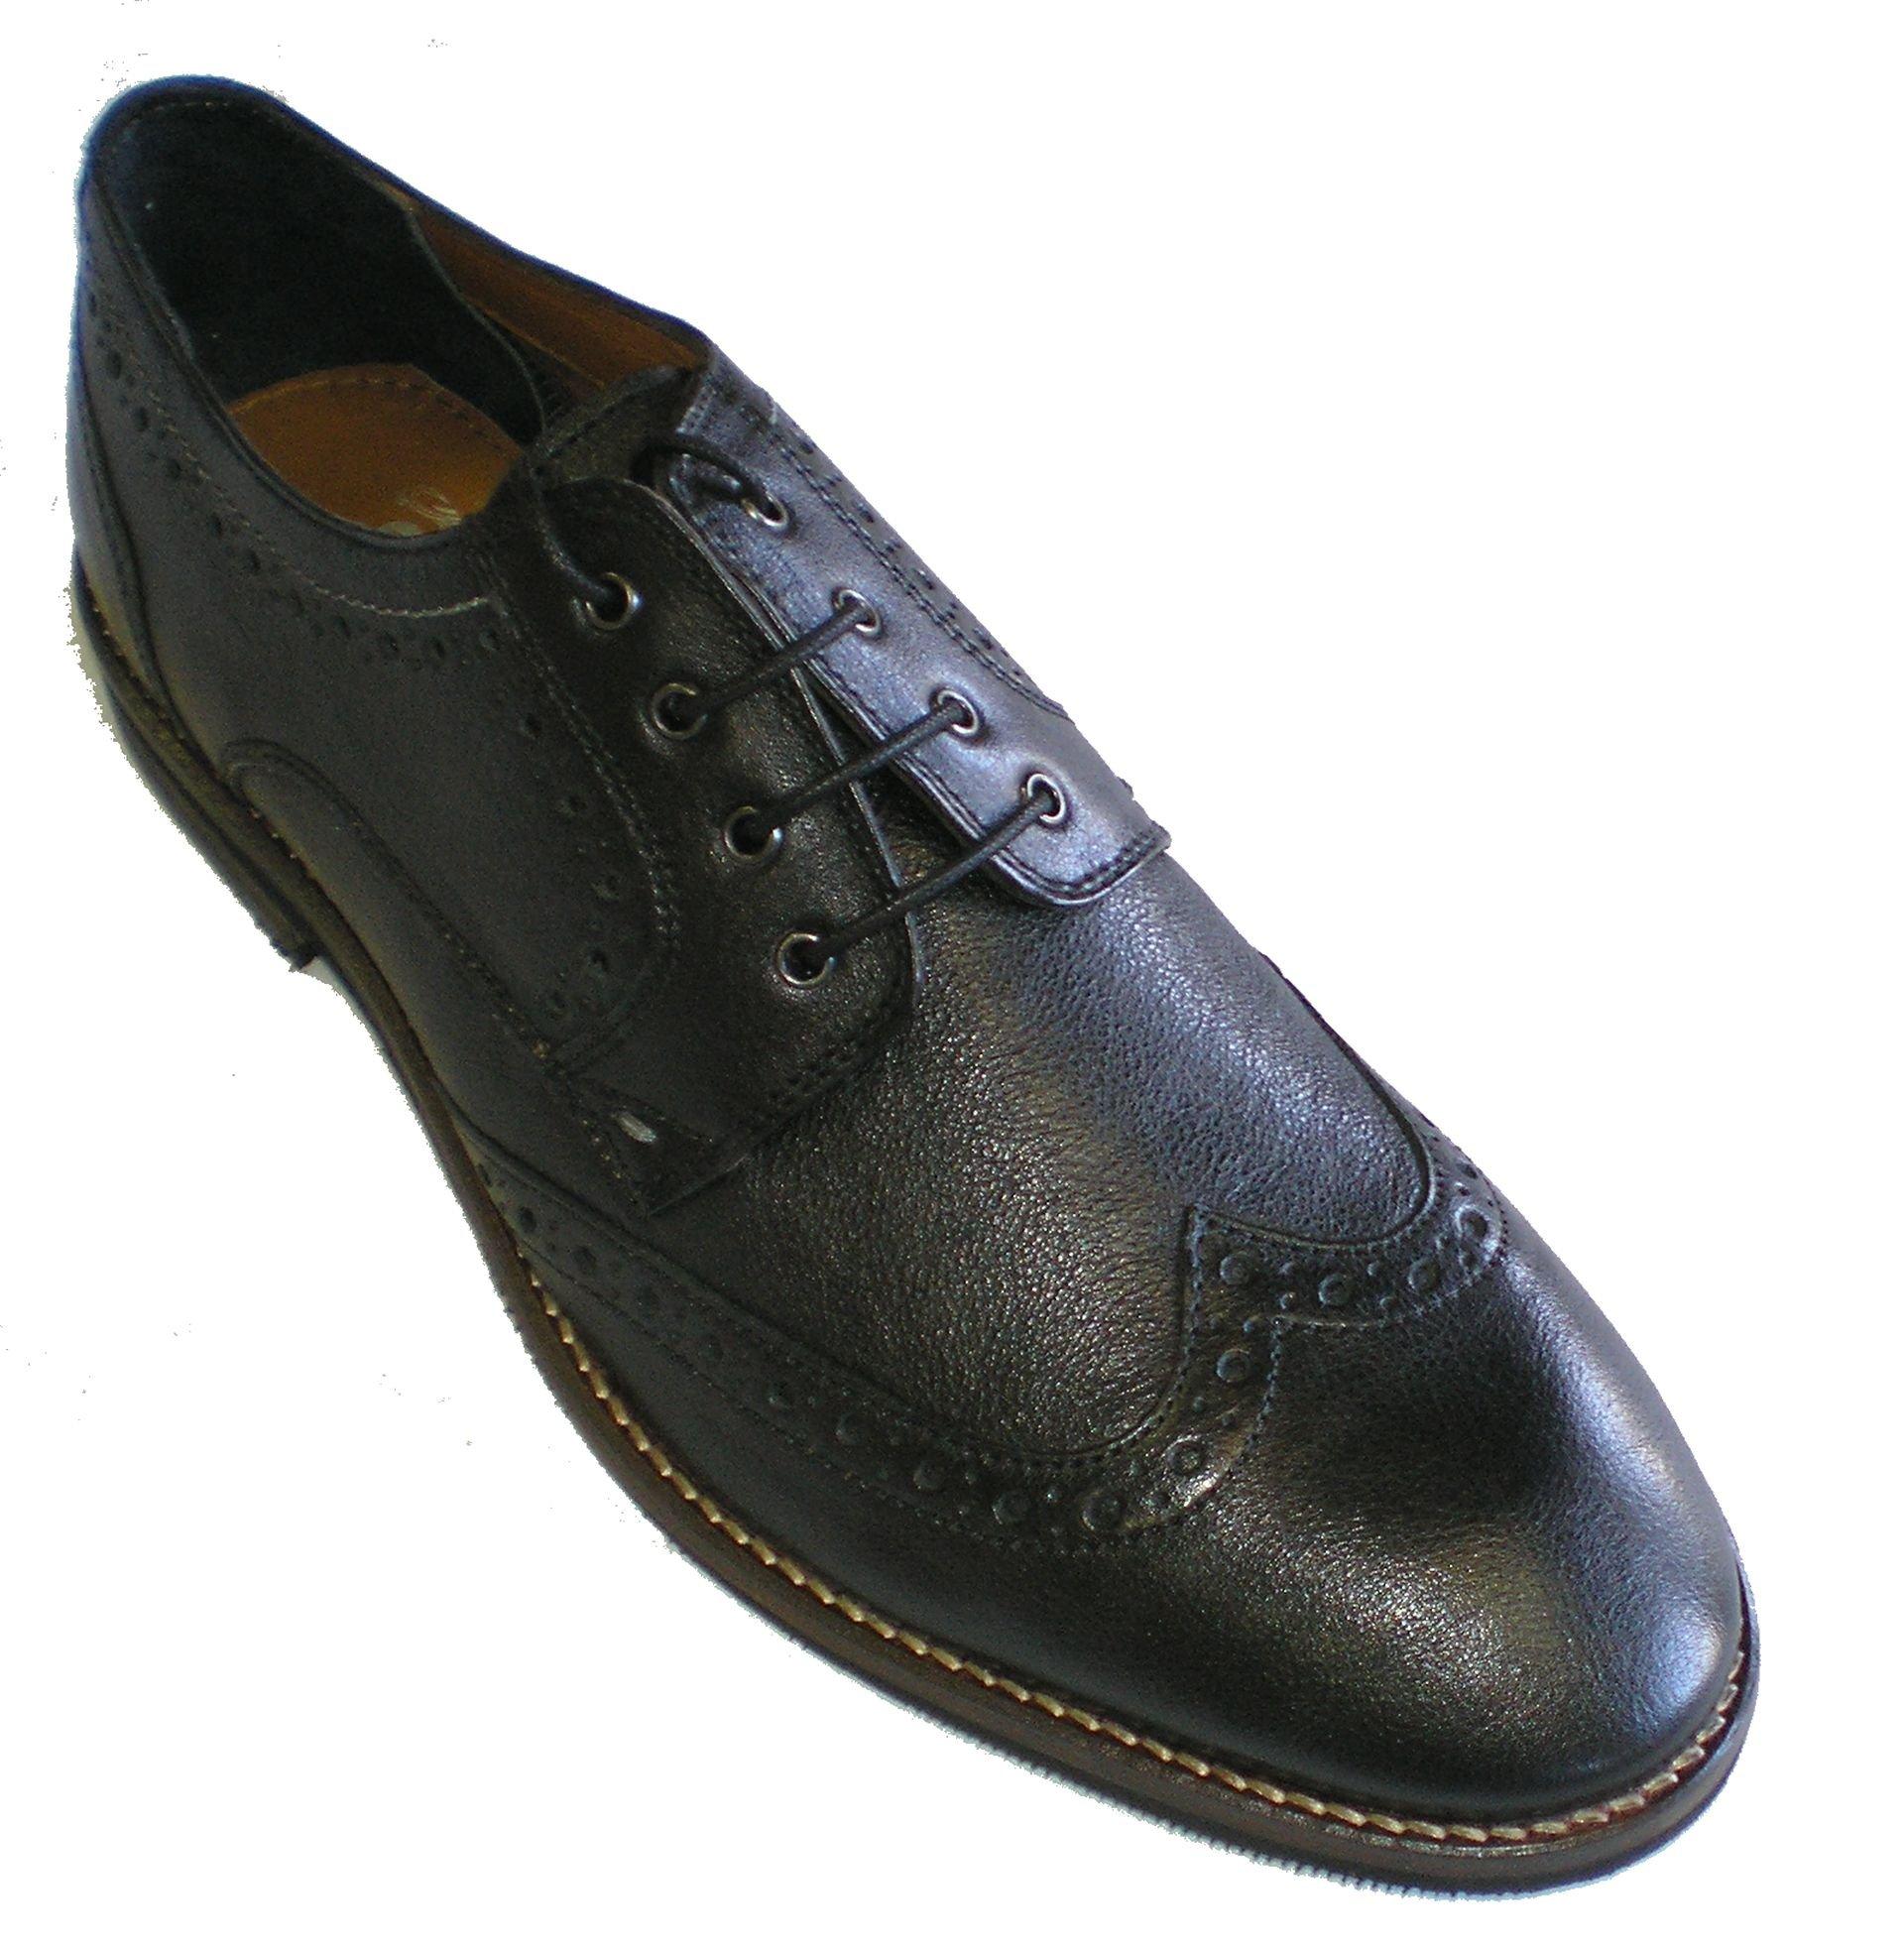 Ara men's Leather sneaker Us 13.5 M (EU 46) black